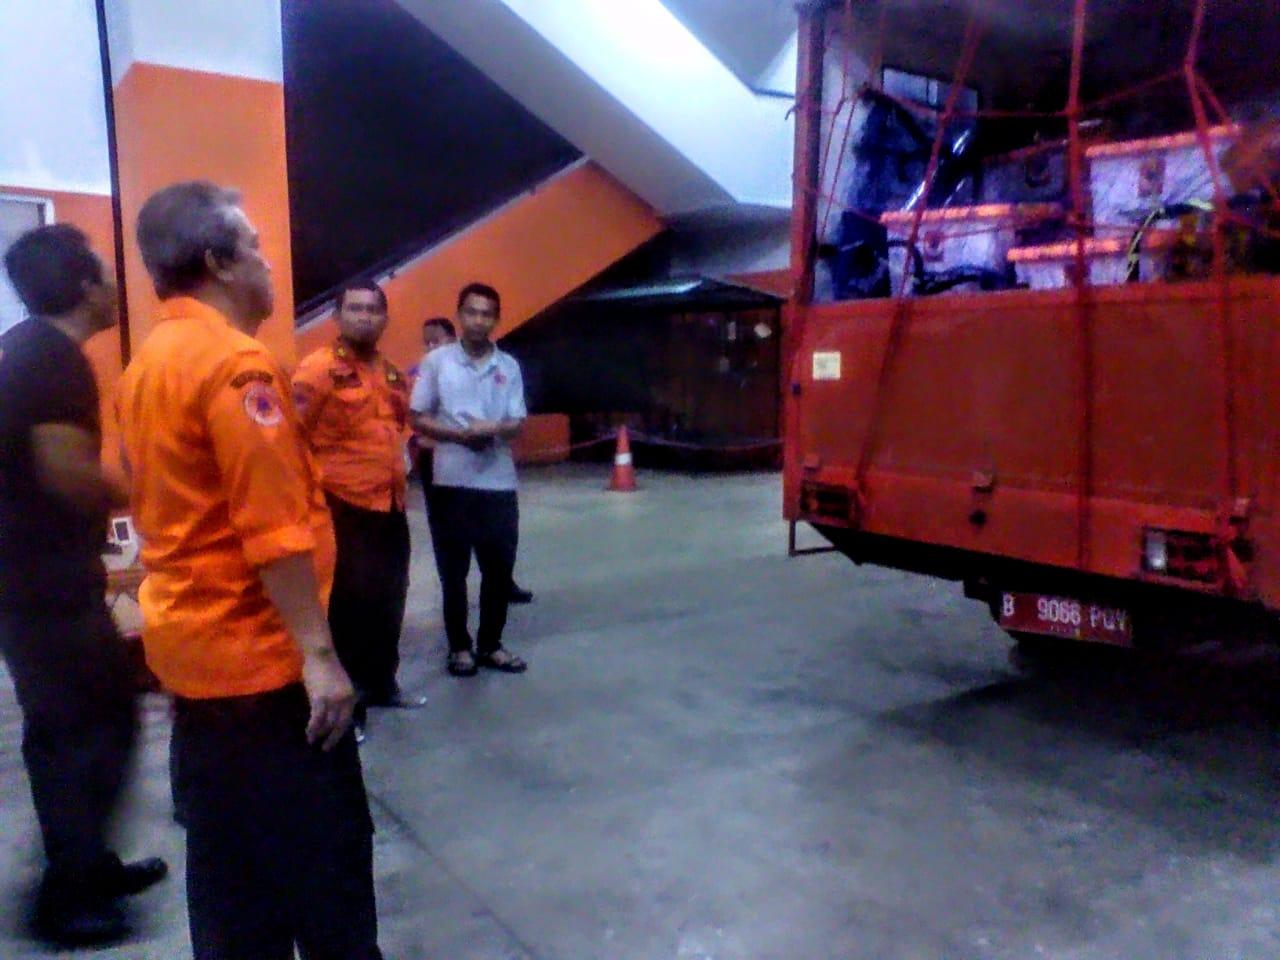 Inilah Fakta Upaya Penanggulangan Bencana Kabupaten Bogor 233